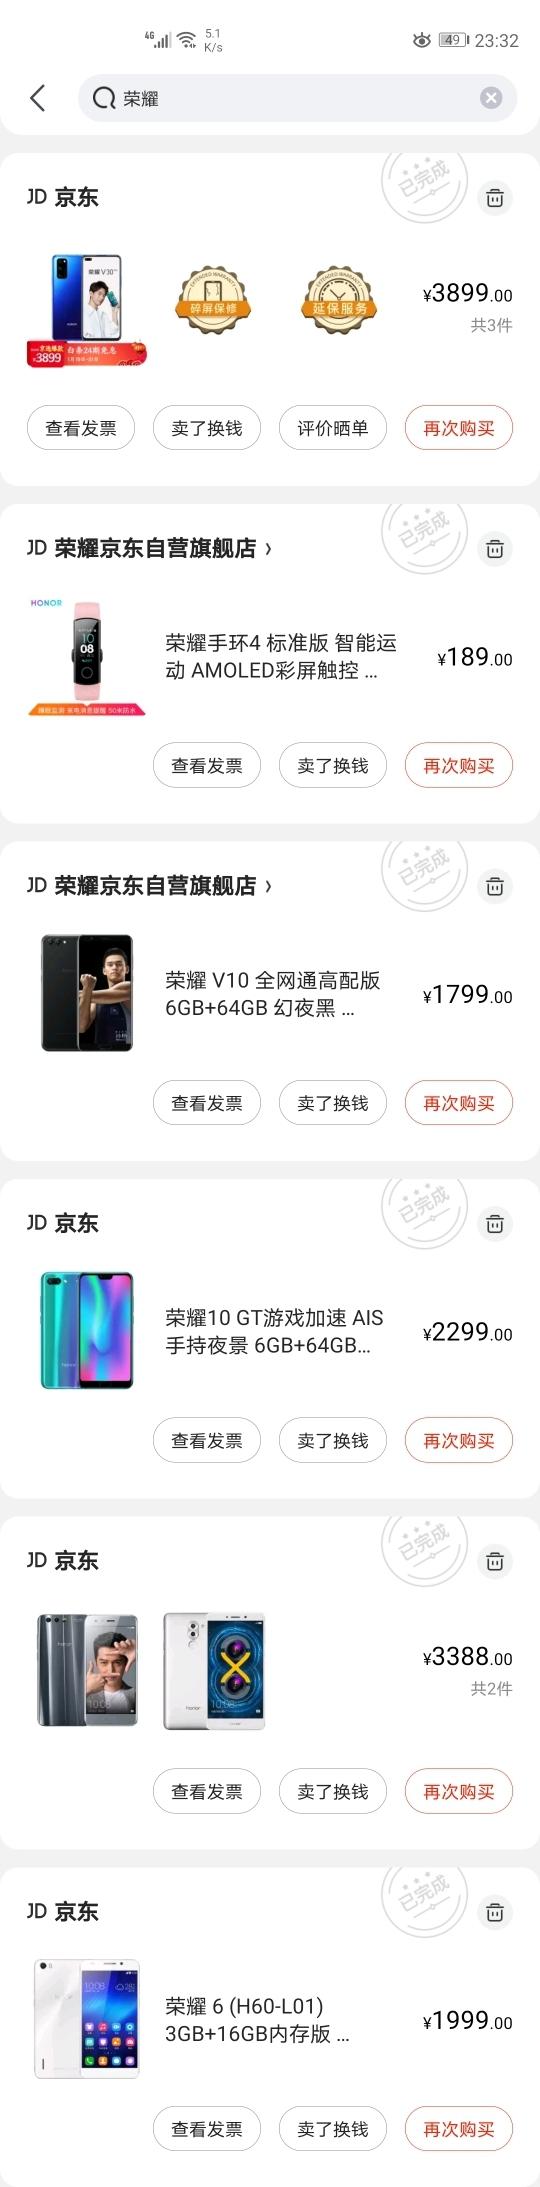 Screenshot_20200125_233249_com.jingdong.app.mall.jpg